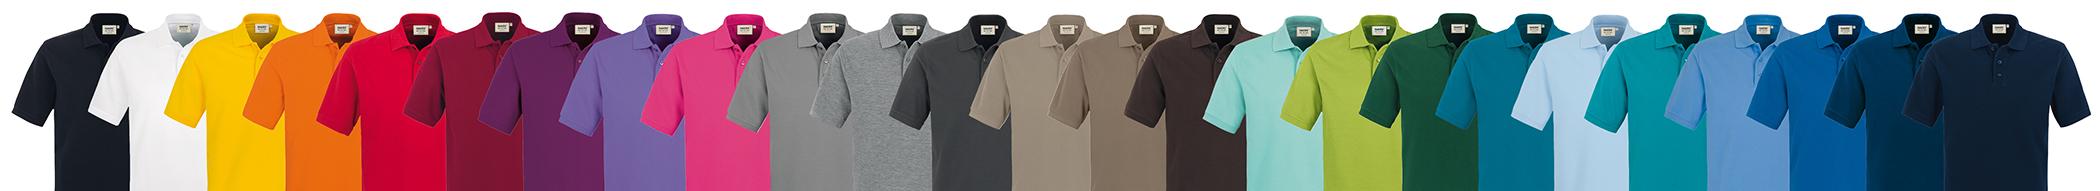 Praxisbekleidung HAKRO Polo Shirts in vielen Farben